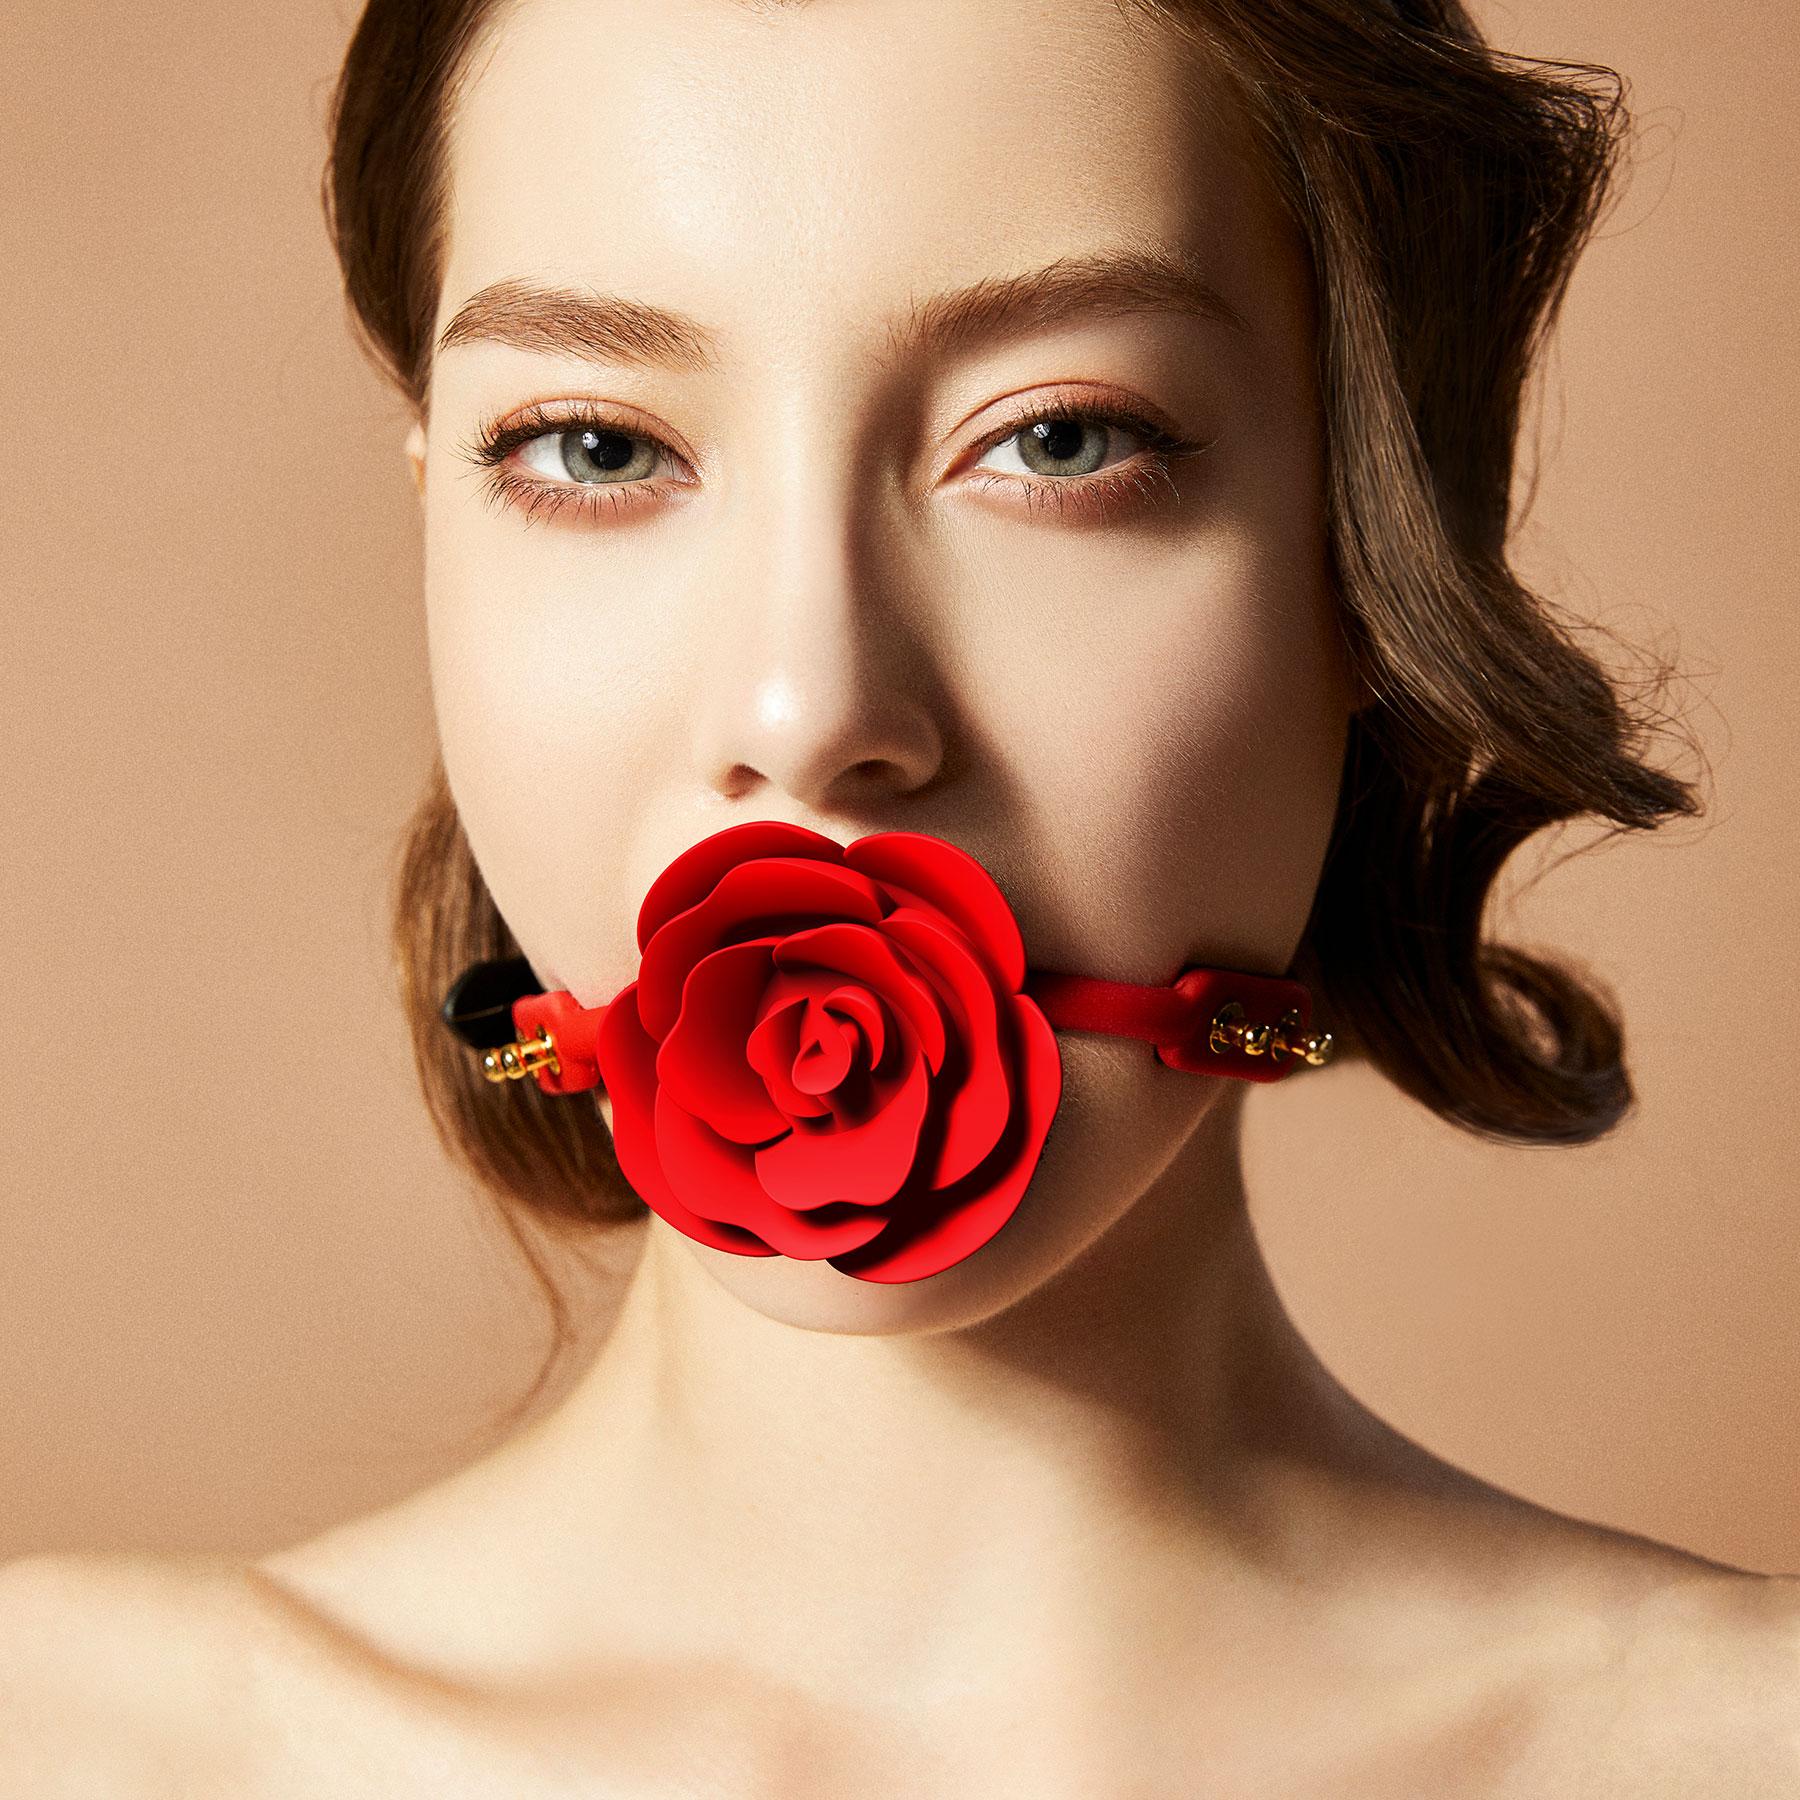 ZALO & UPKO Doll Designer Collection Silicone Rose Ball Gag Displayed On Model